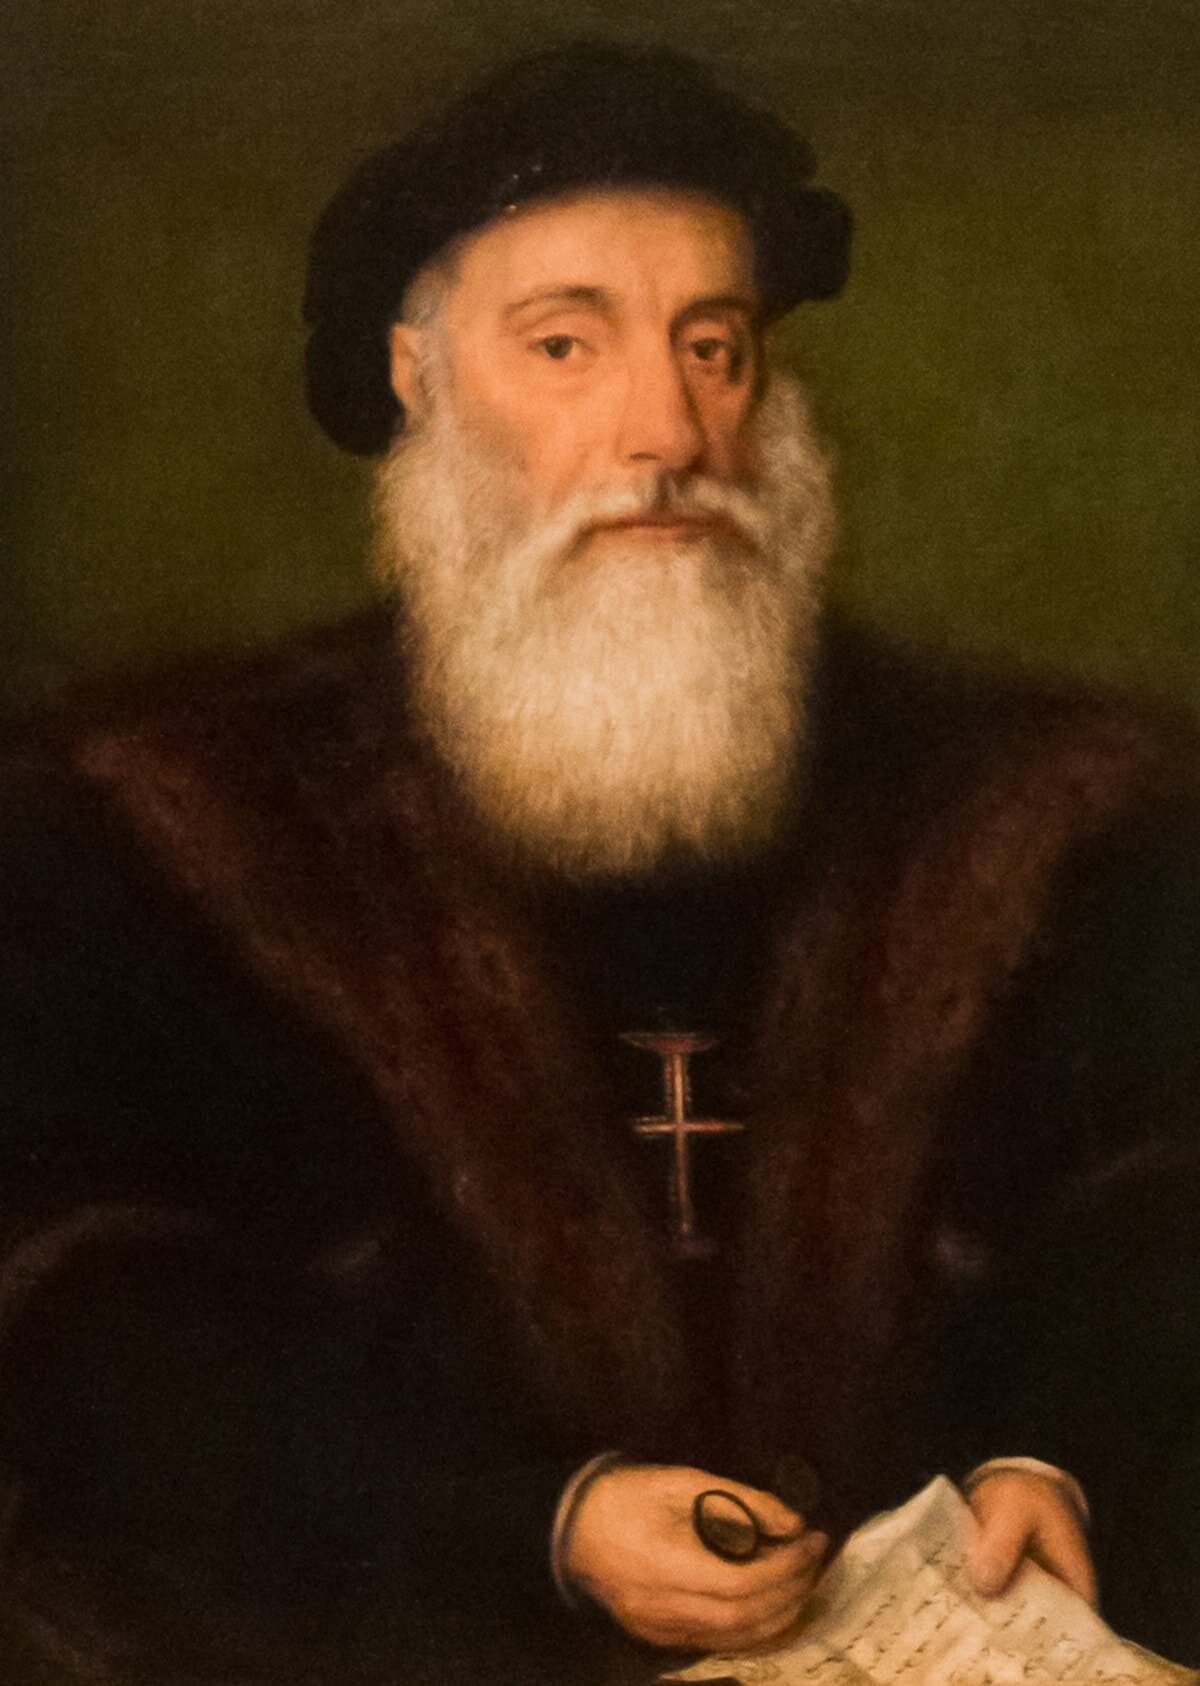 Vasco da Gama, the first famous explorer of world history on this list!